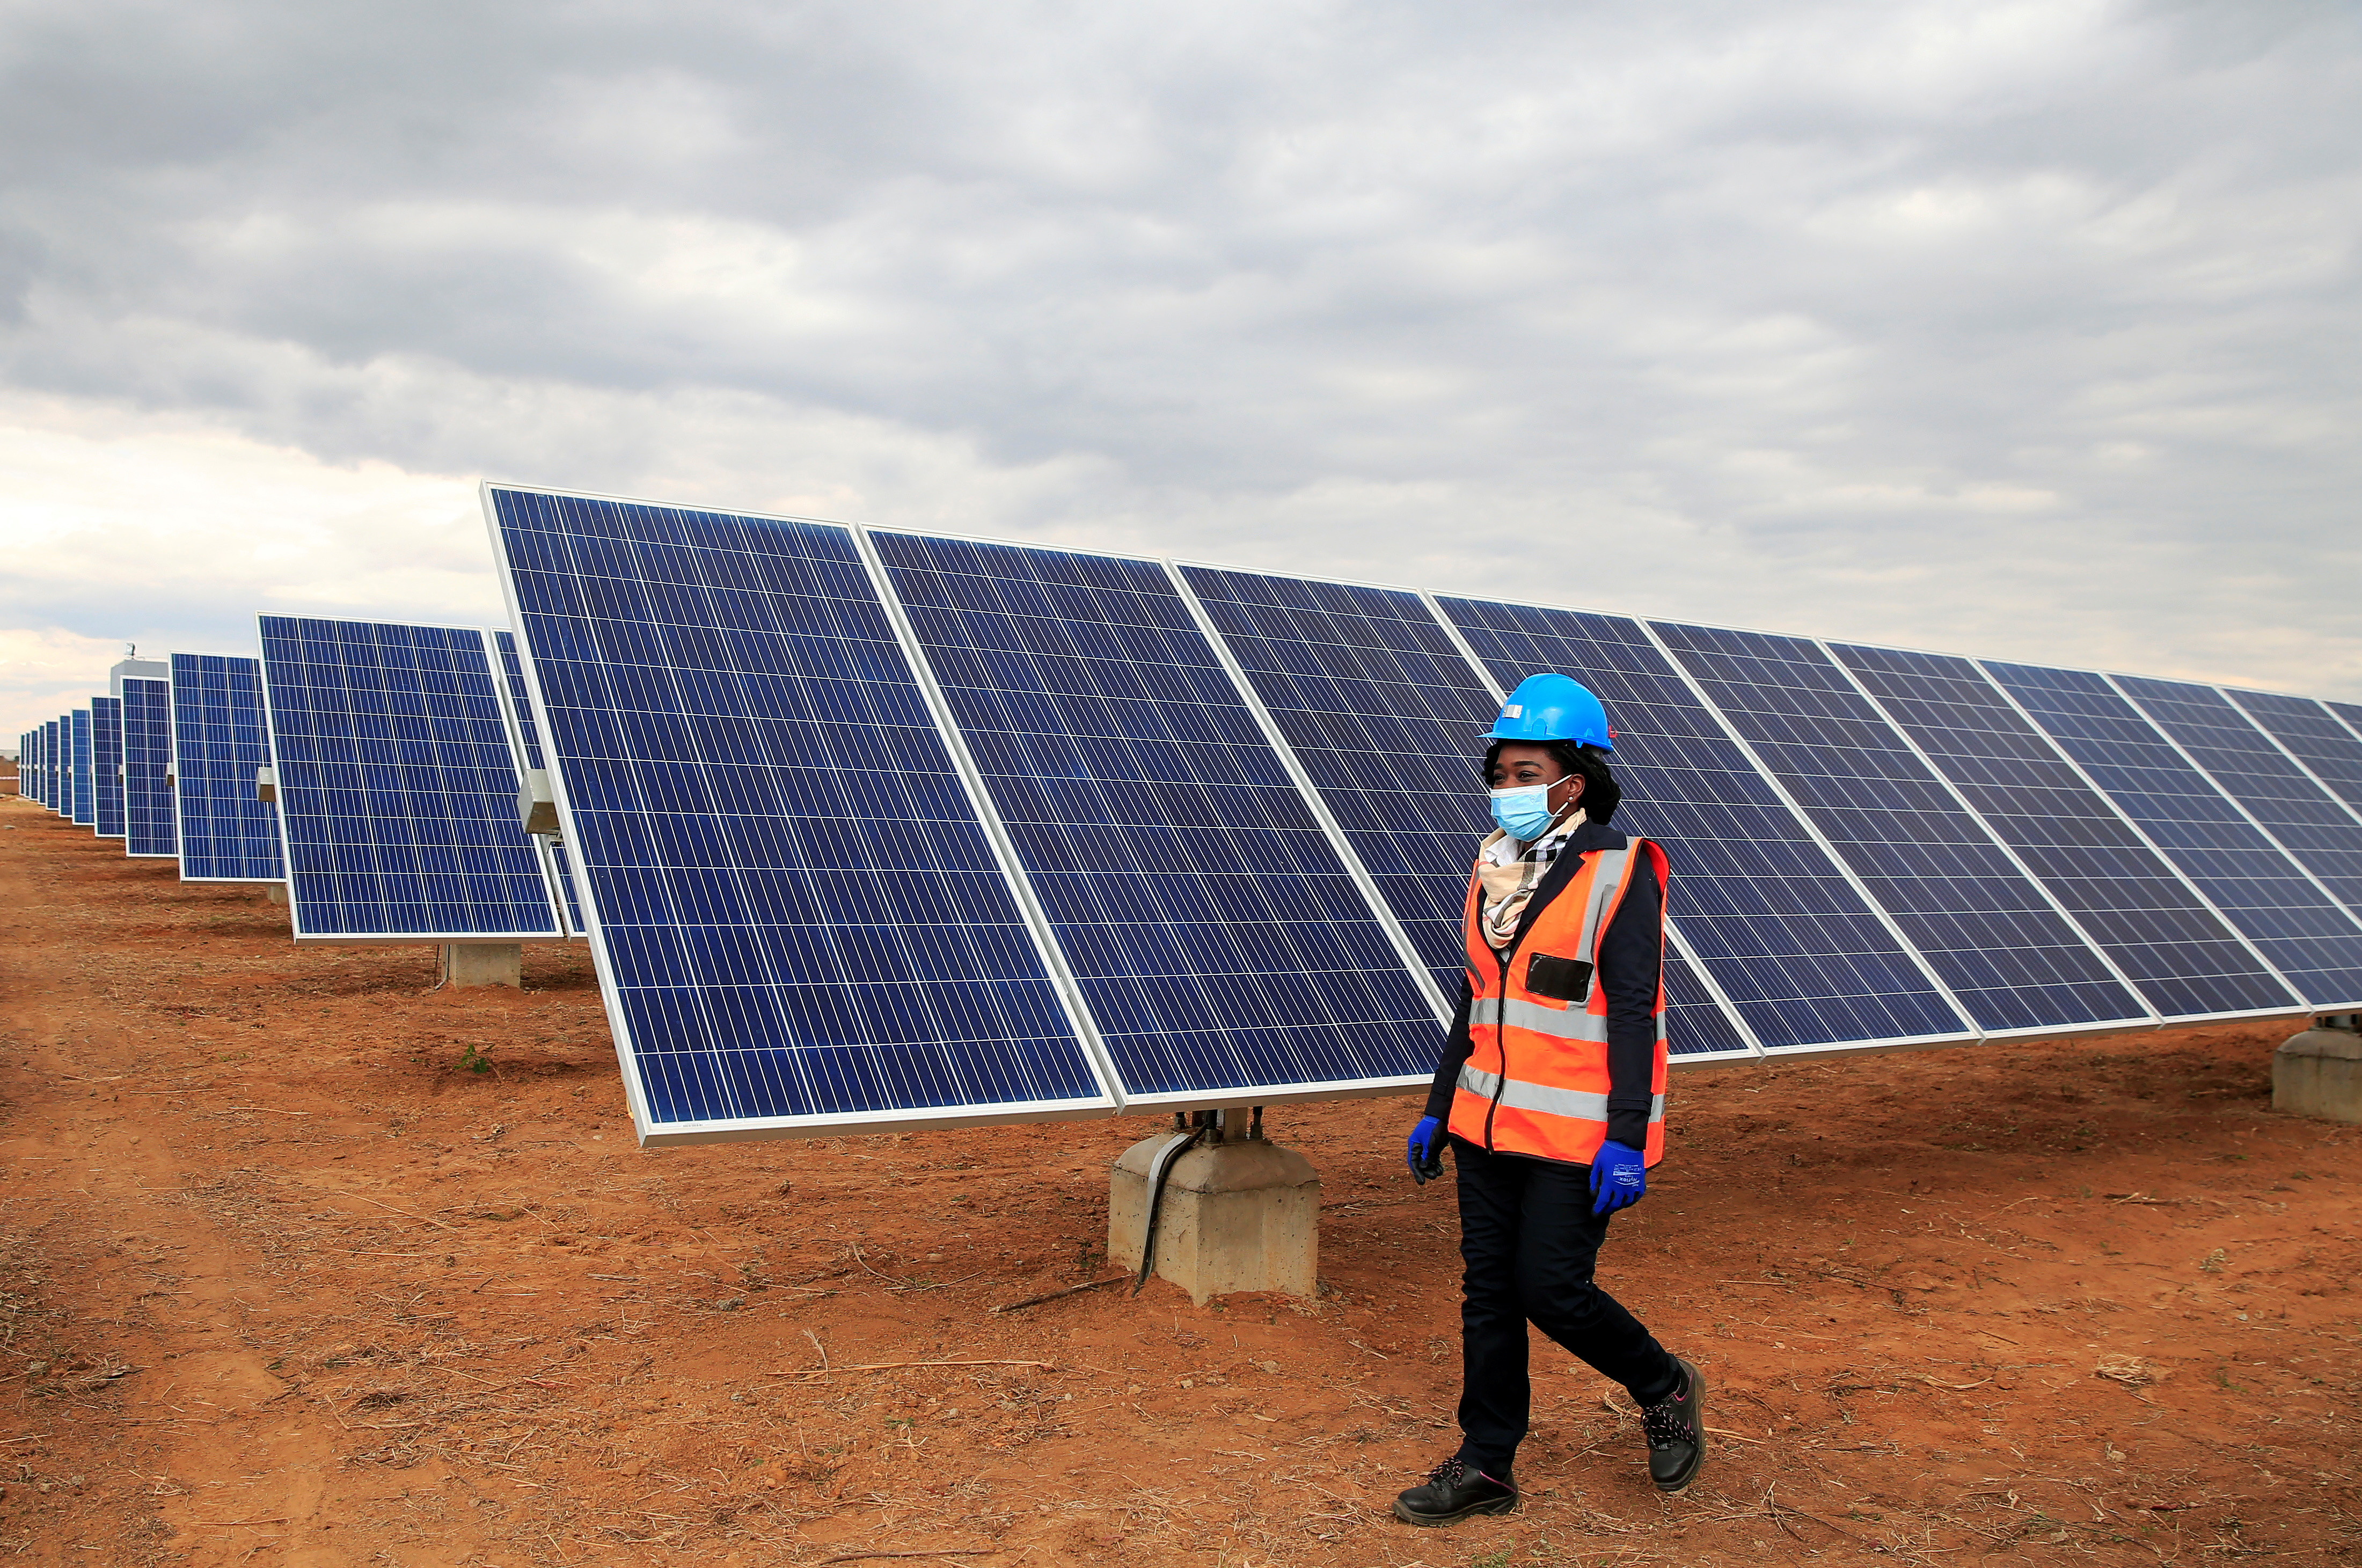 A worker walks past solar panels at Centragrid power plant in Nyabira, Zimbabwe, June 22, 2020. Picture taken June 22, 2020. REUTERS/Philimon Bulawayo - RC2XEH9KFHI5